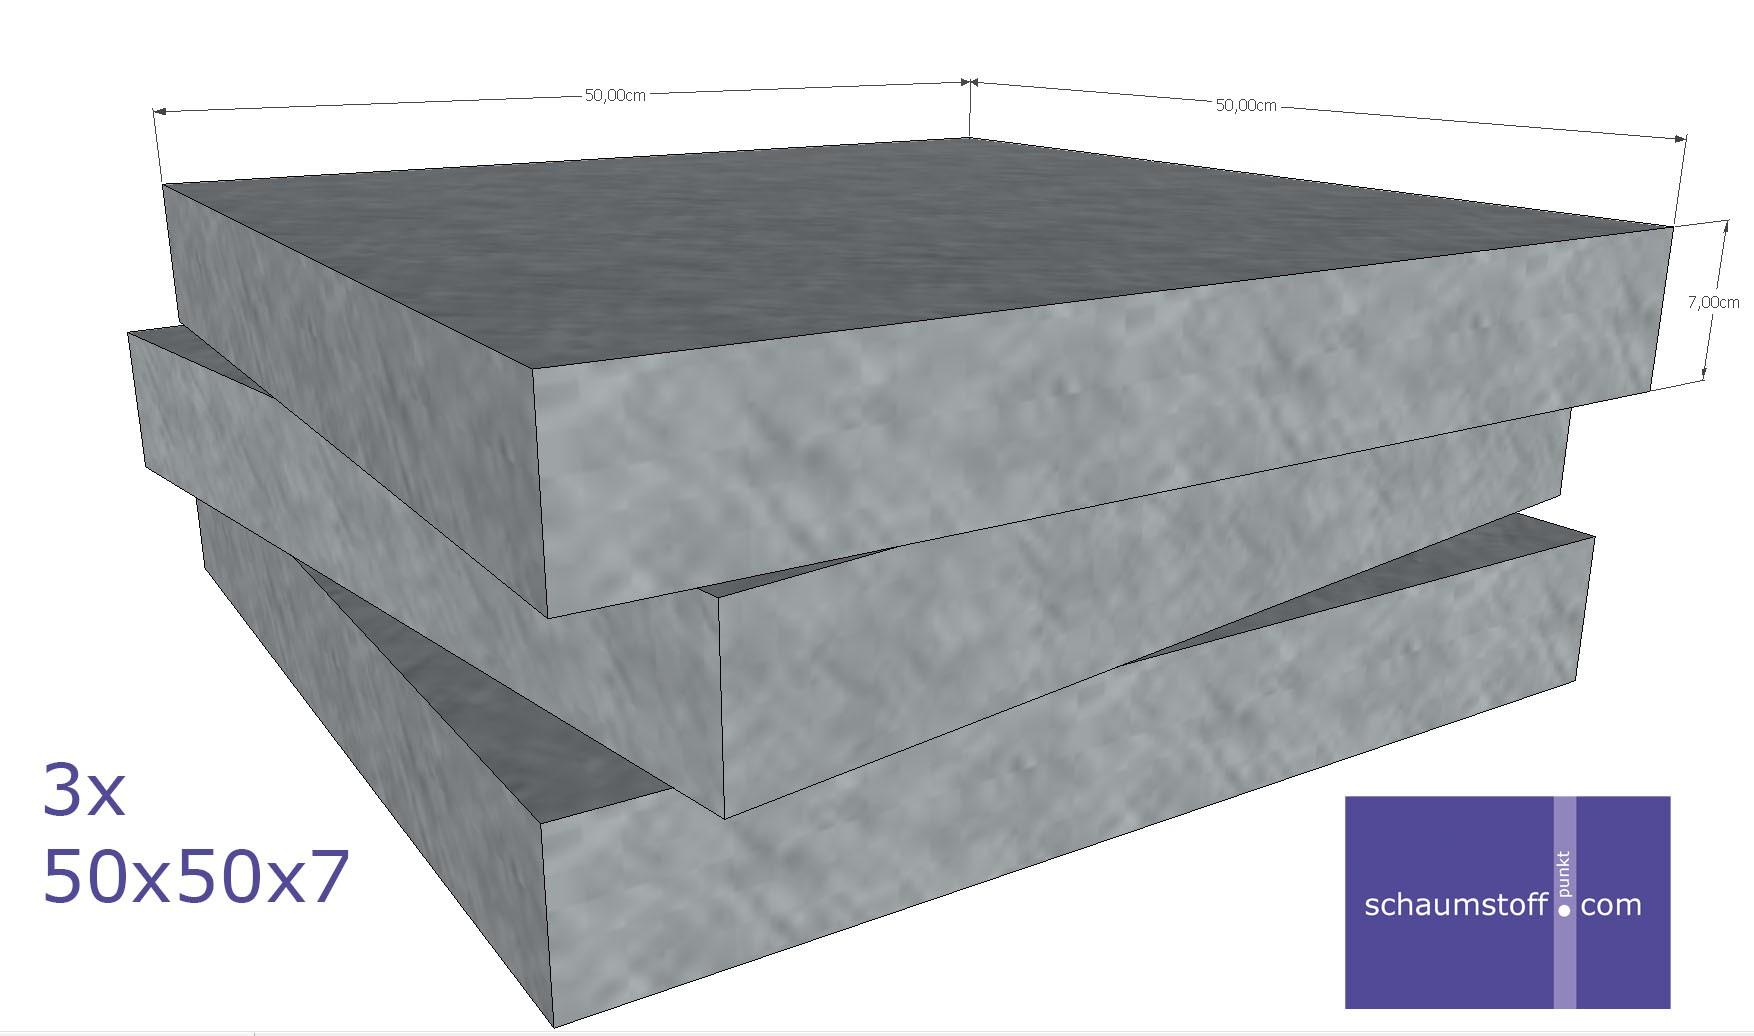 schaumstoff platten set 3 st ck a 50x50x7 cm. Black Bedroom Furniture Sets. Home Design Ideas